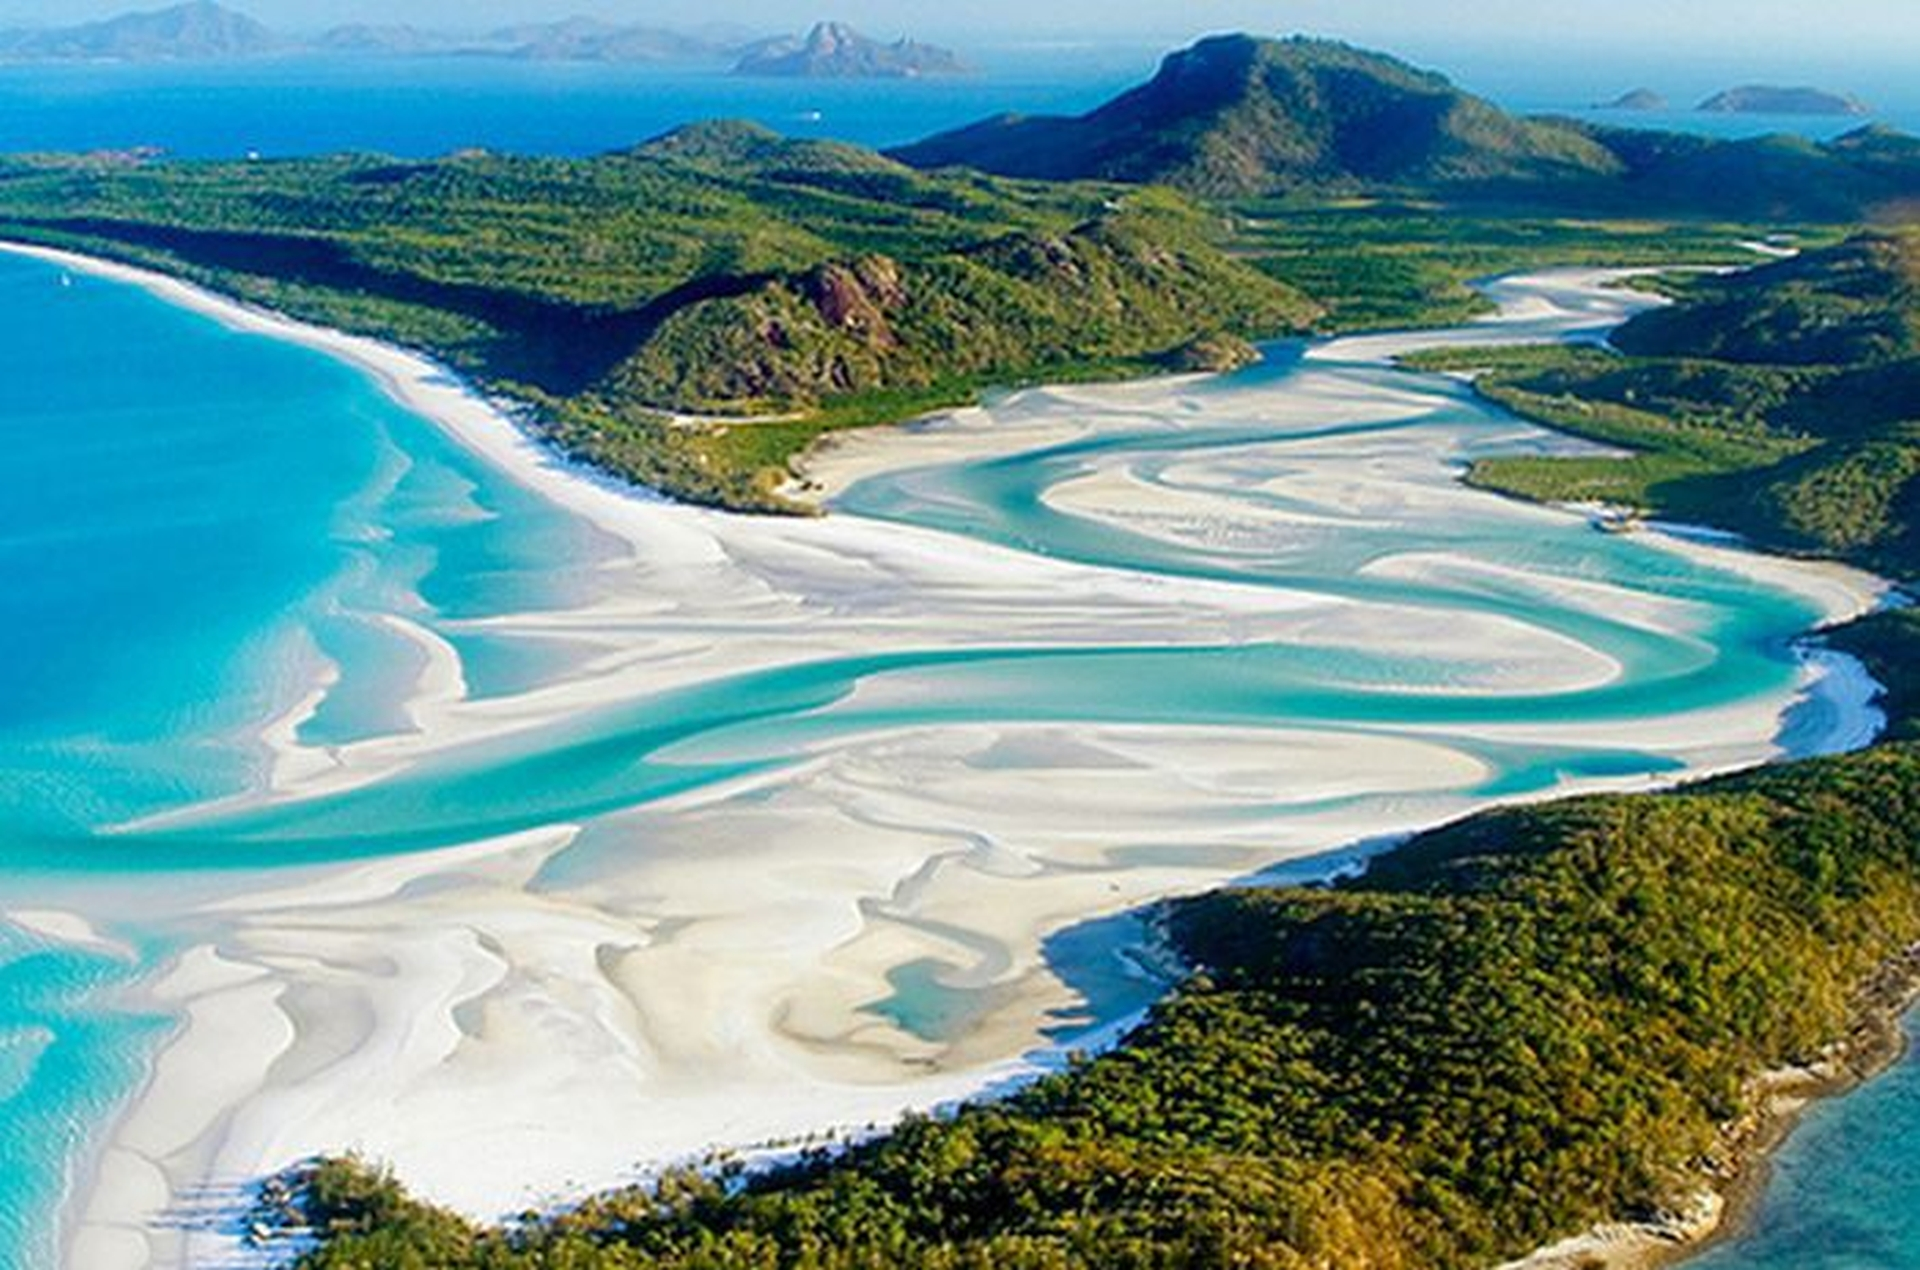 La playa Whitehaven (Isla de Whitsunday, Australia)